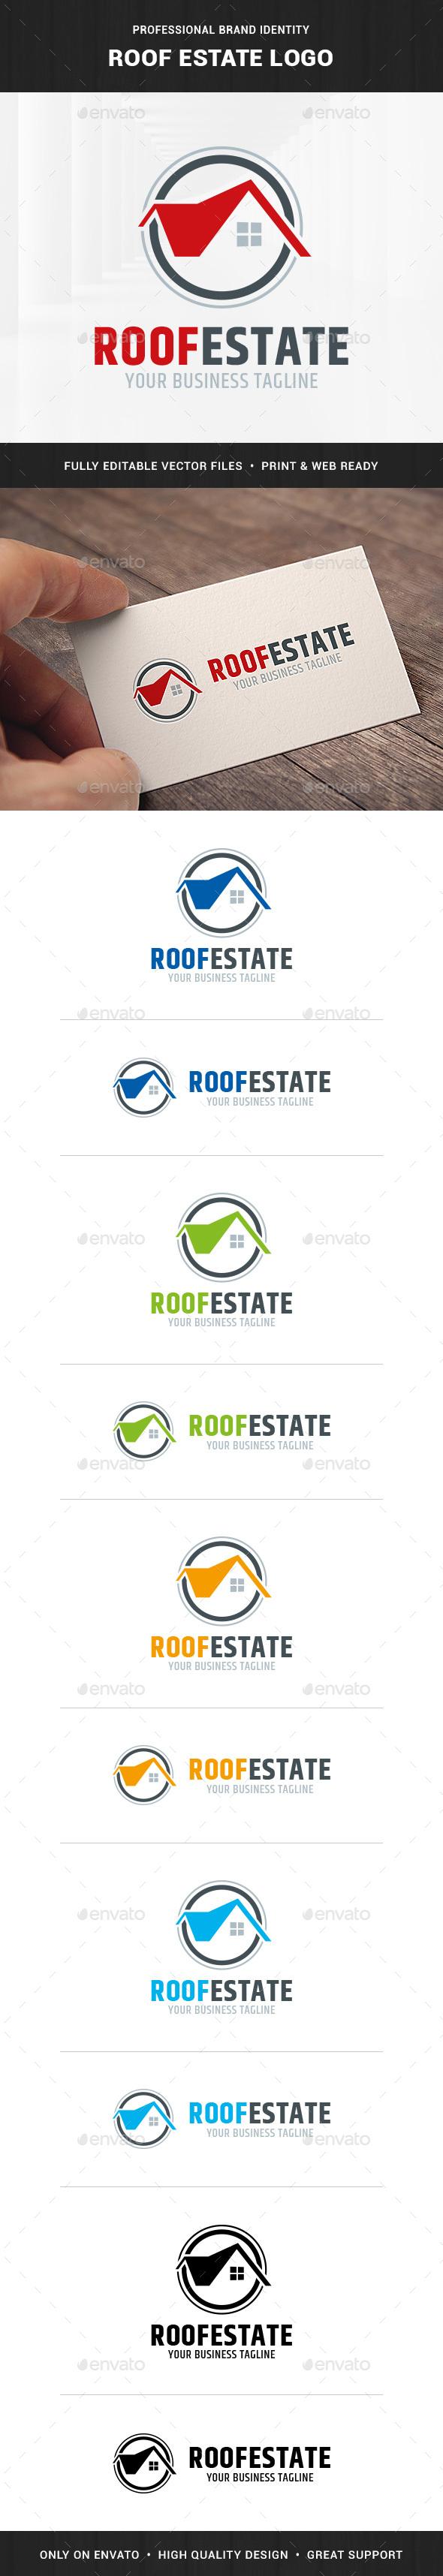 Roof Estate Logo Template - Buildings Logo Templates